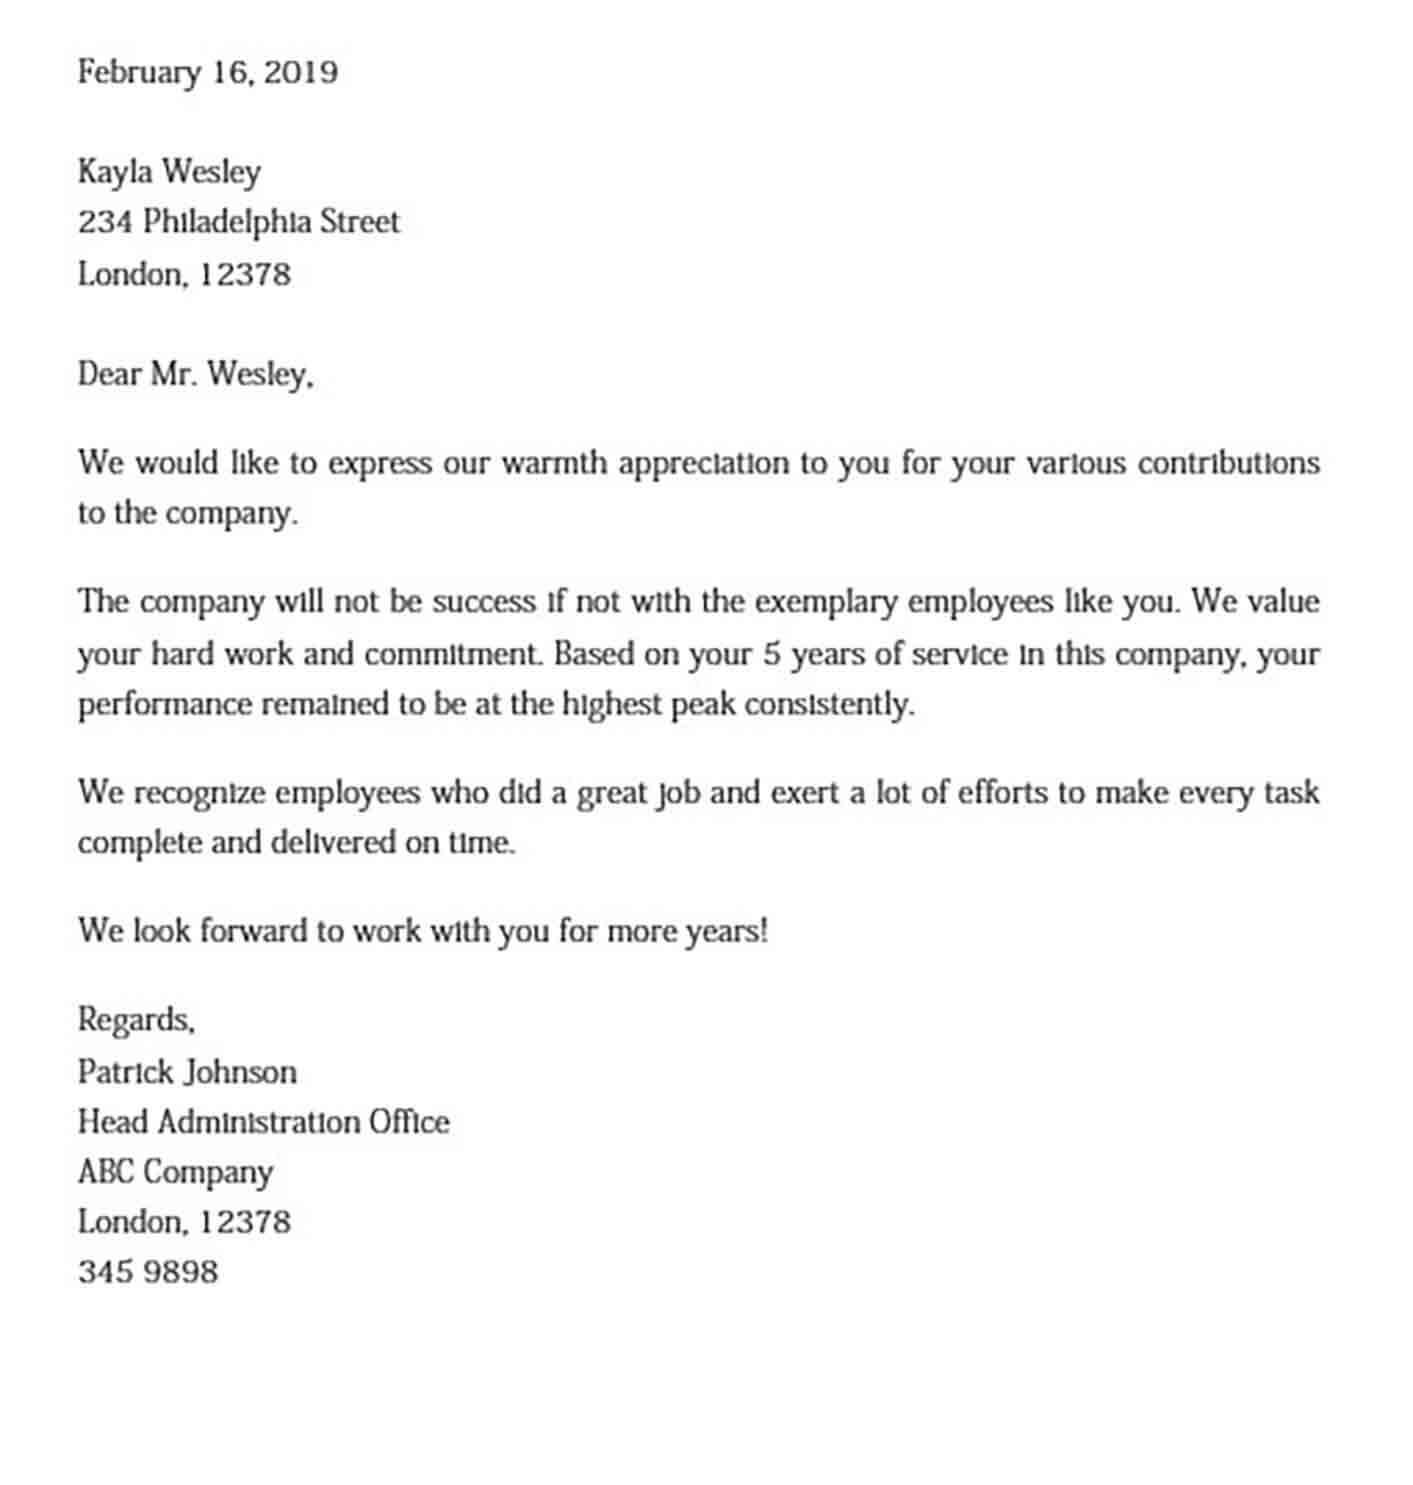 Formal Employee Appreciation Letter DOC